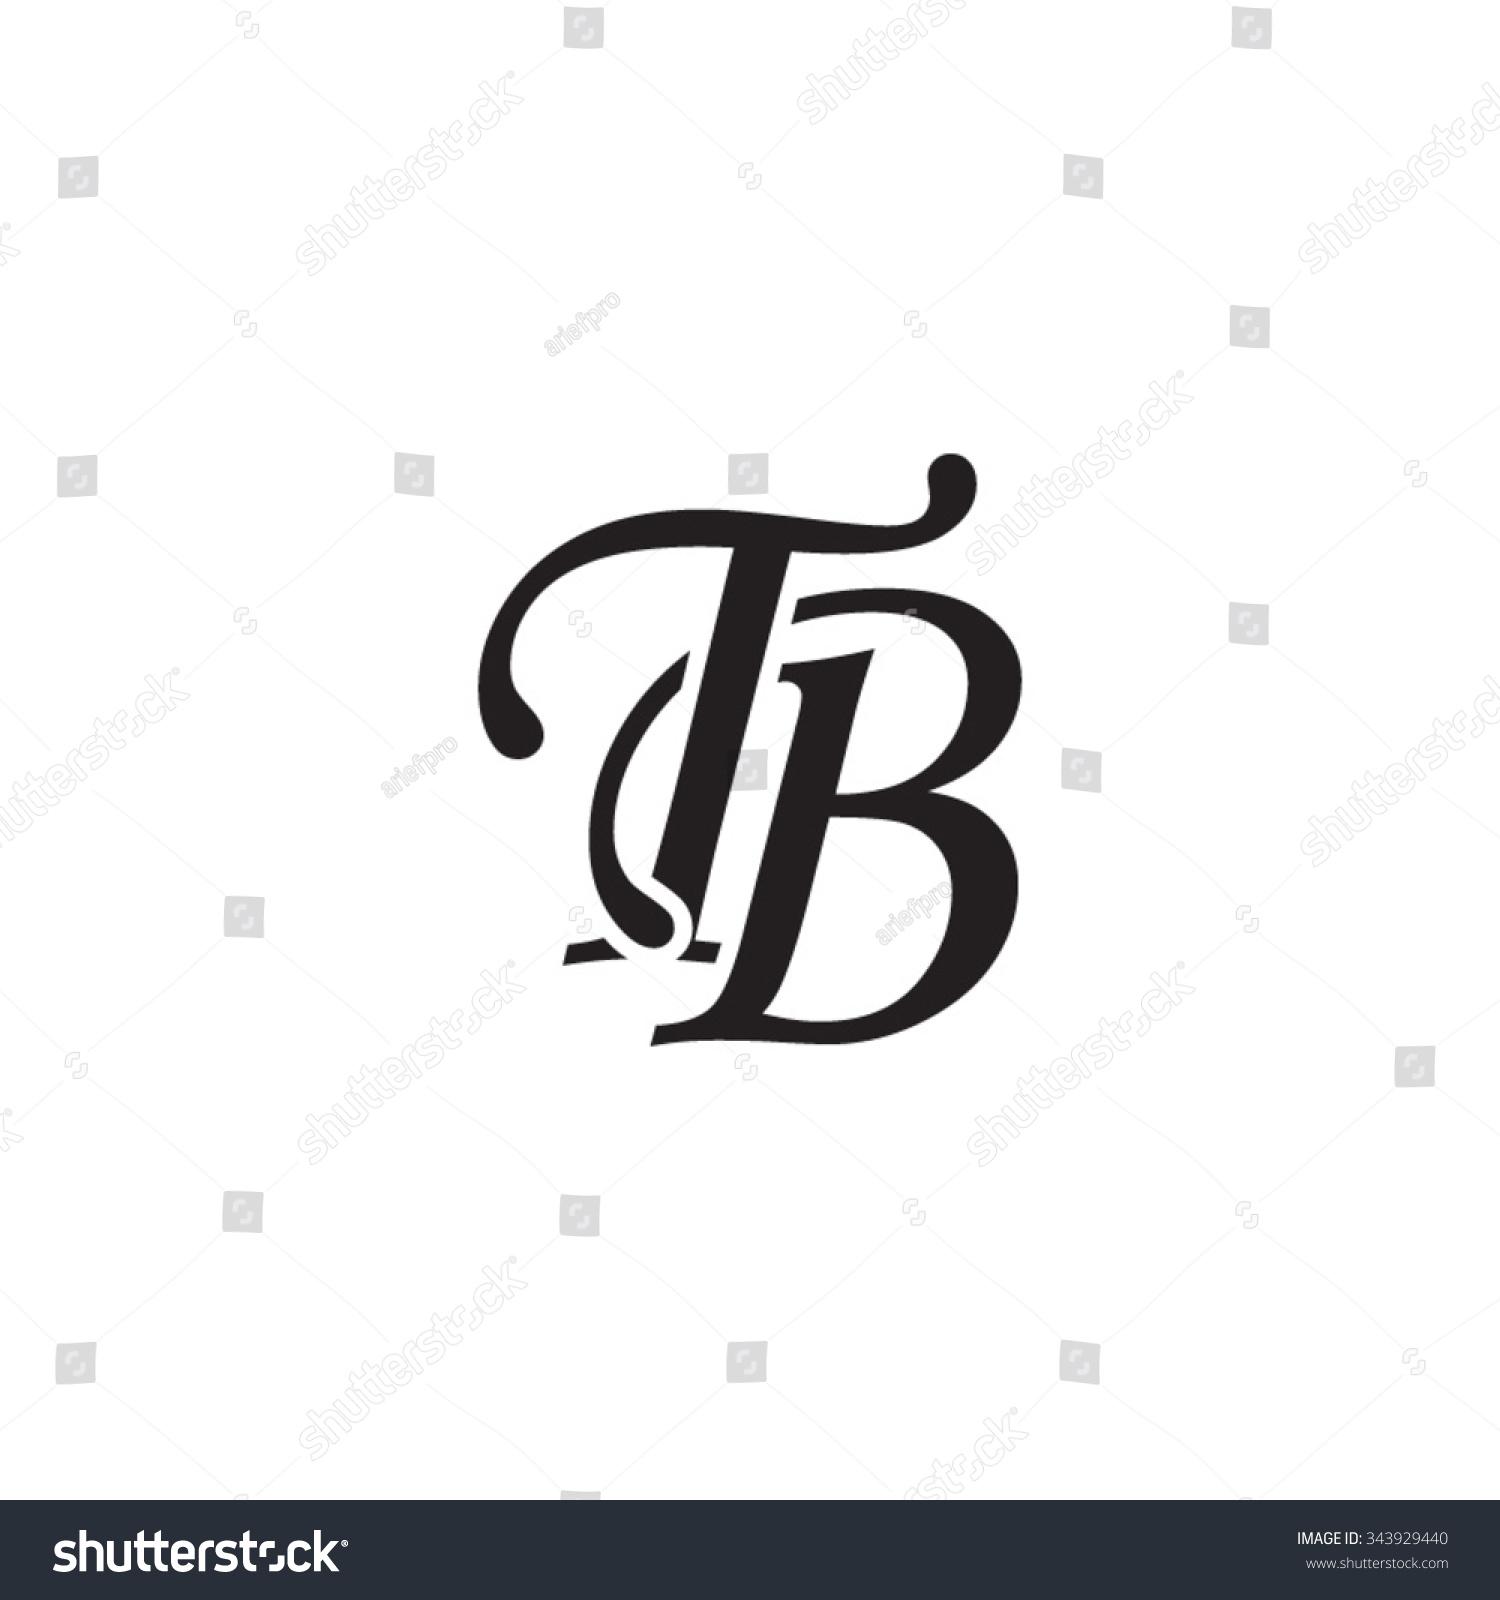 Monograms, Tins and Logos on Pinterest